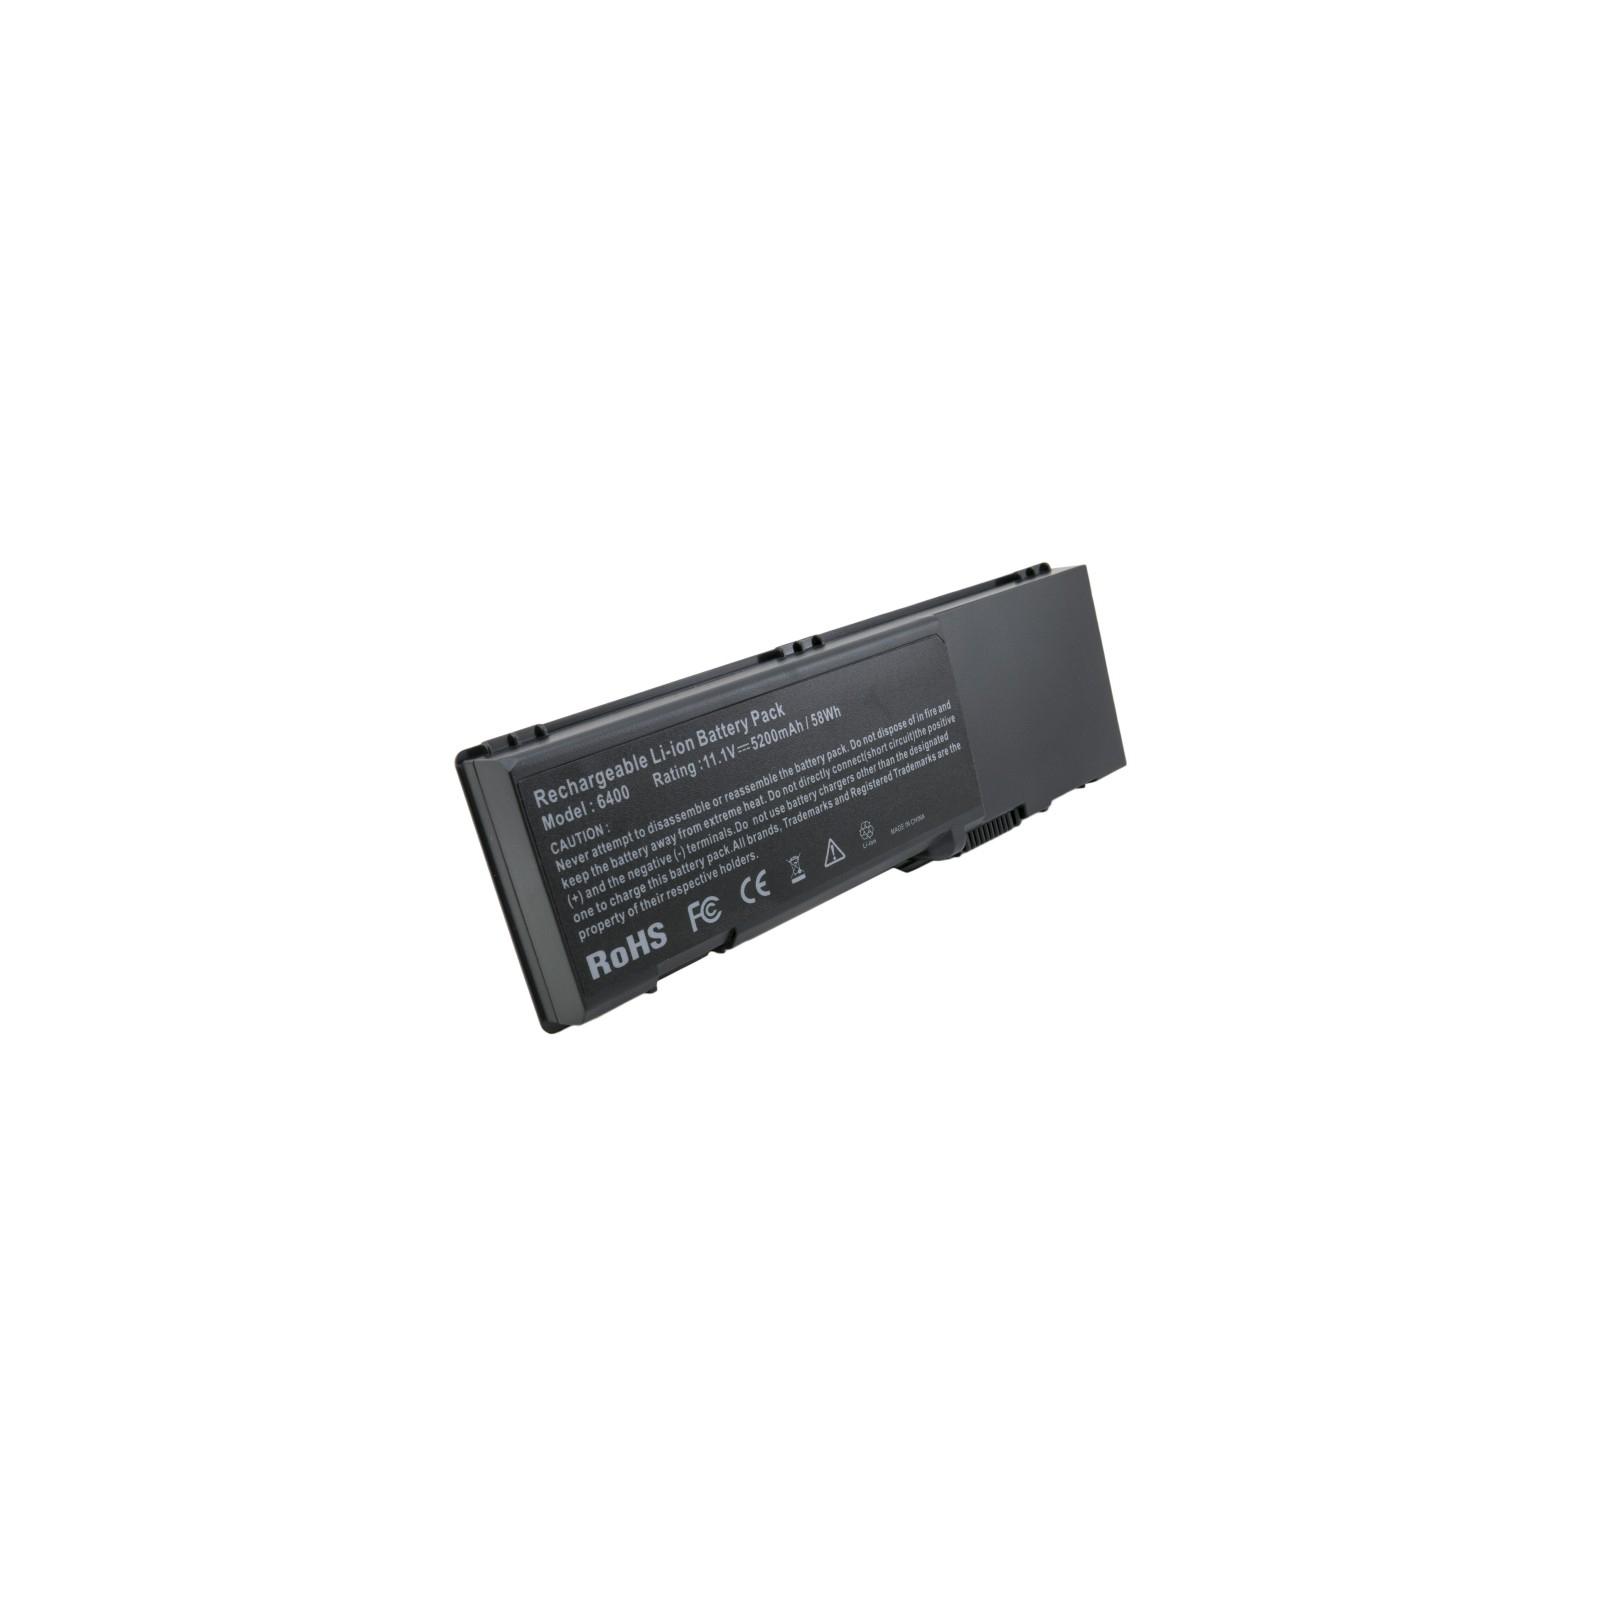 Аккумулятор для ноутбука Dell Inspiron 6400, 5200 mAh EXTRADIGITAL (BND3931)